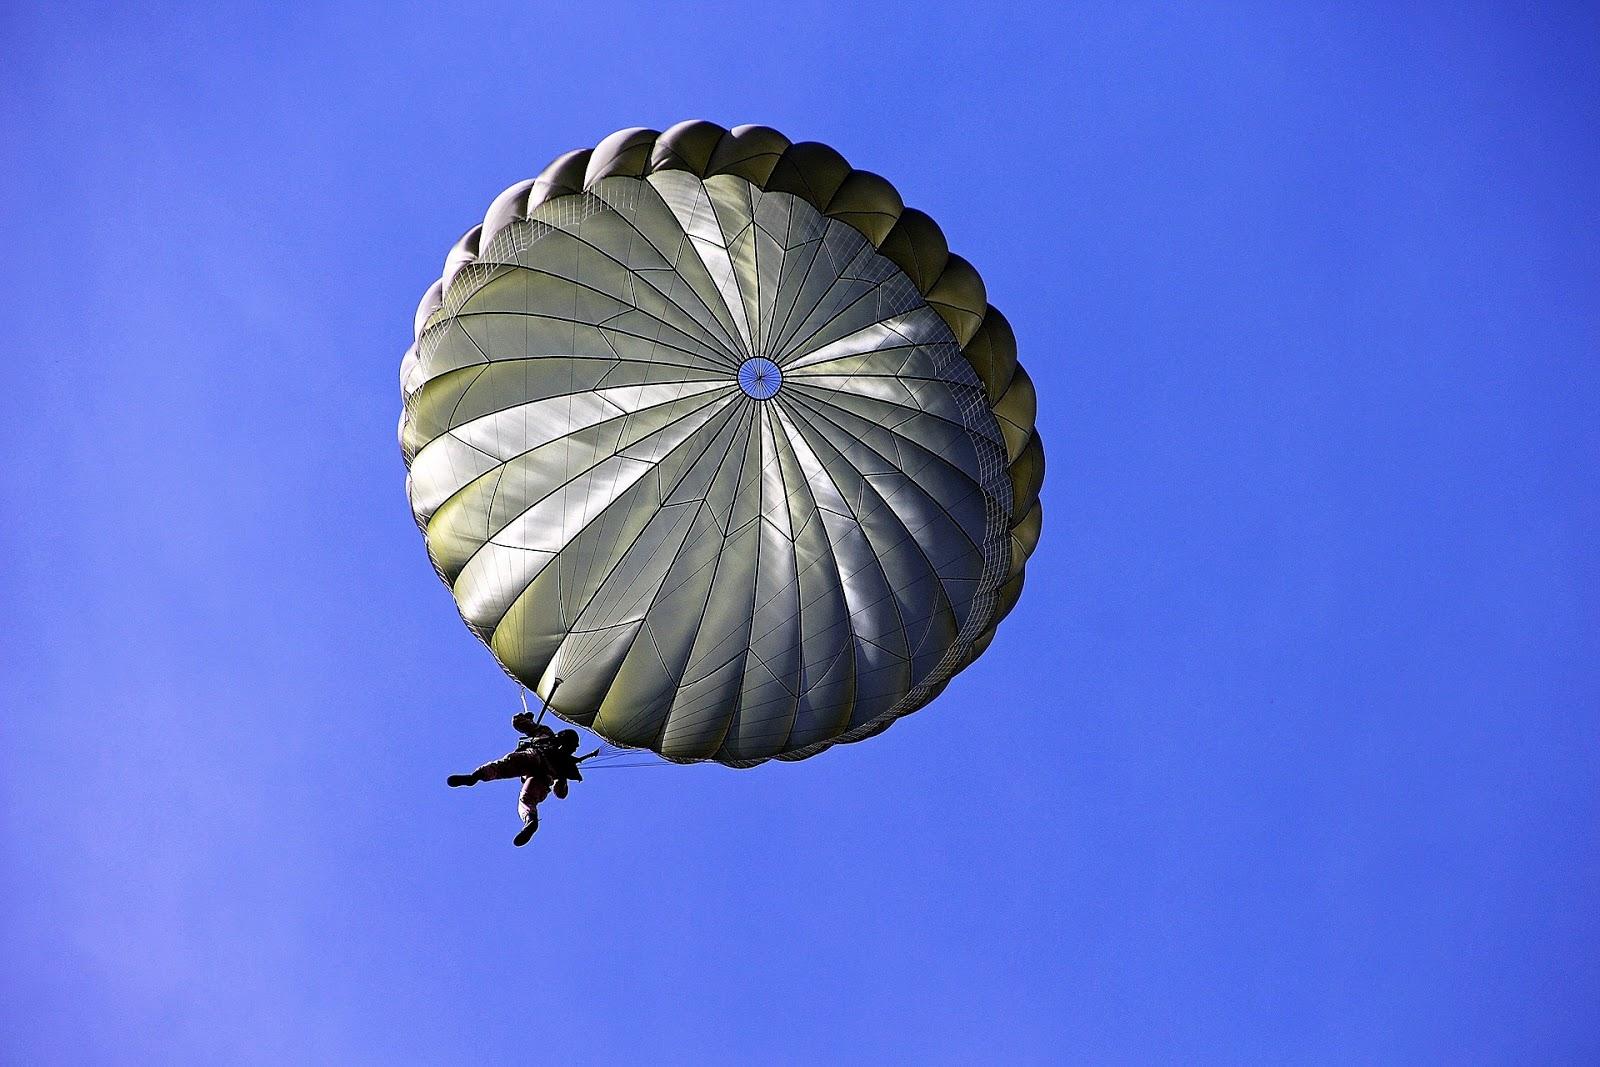 Parachuting away with the money